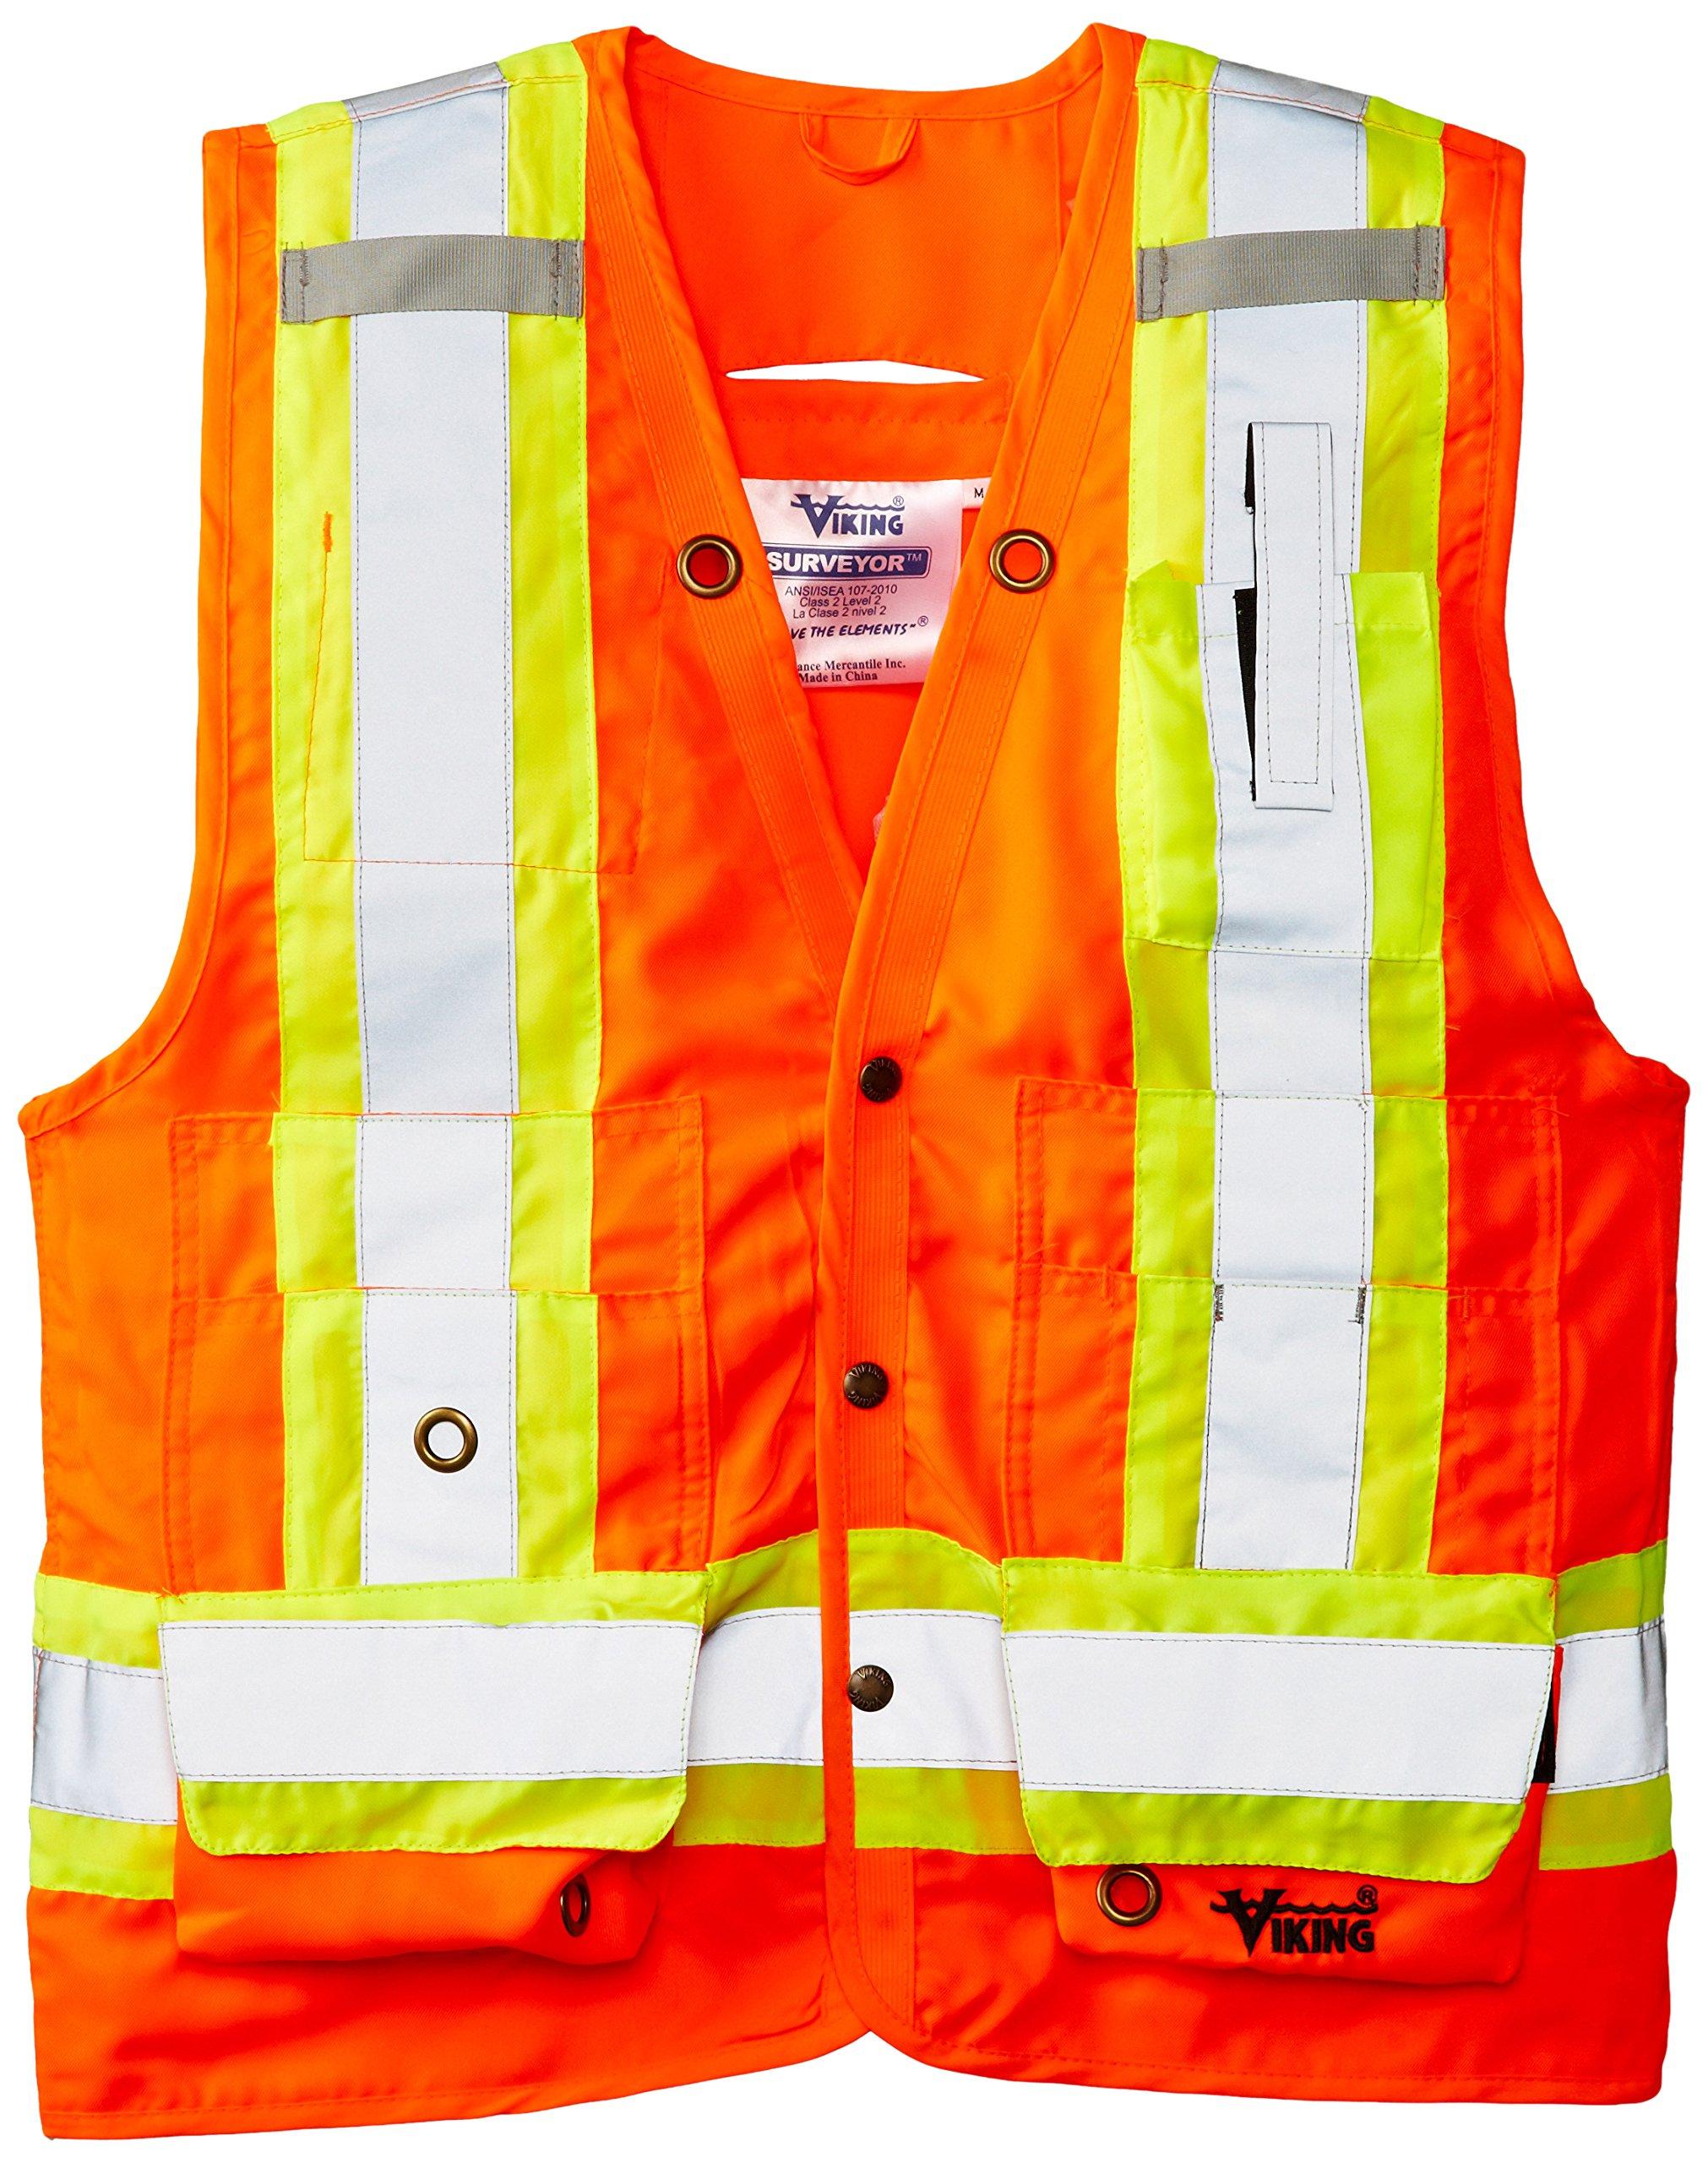 Viking Surveyor Hi-Vis Safety Vest, Orange, XX-Large